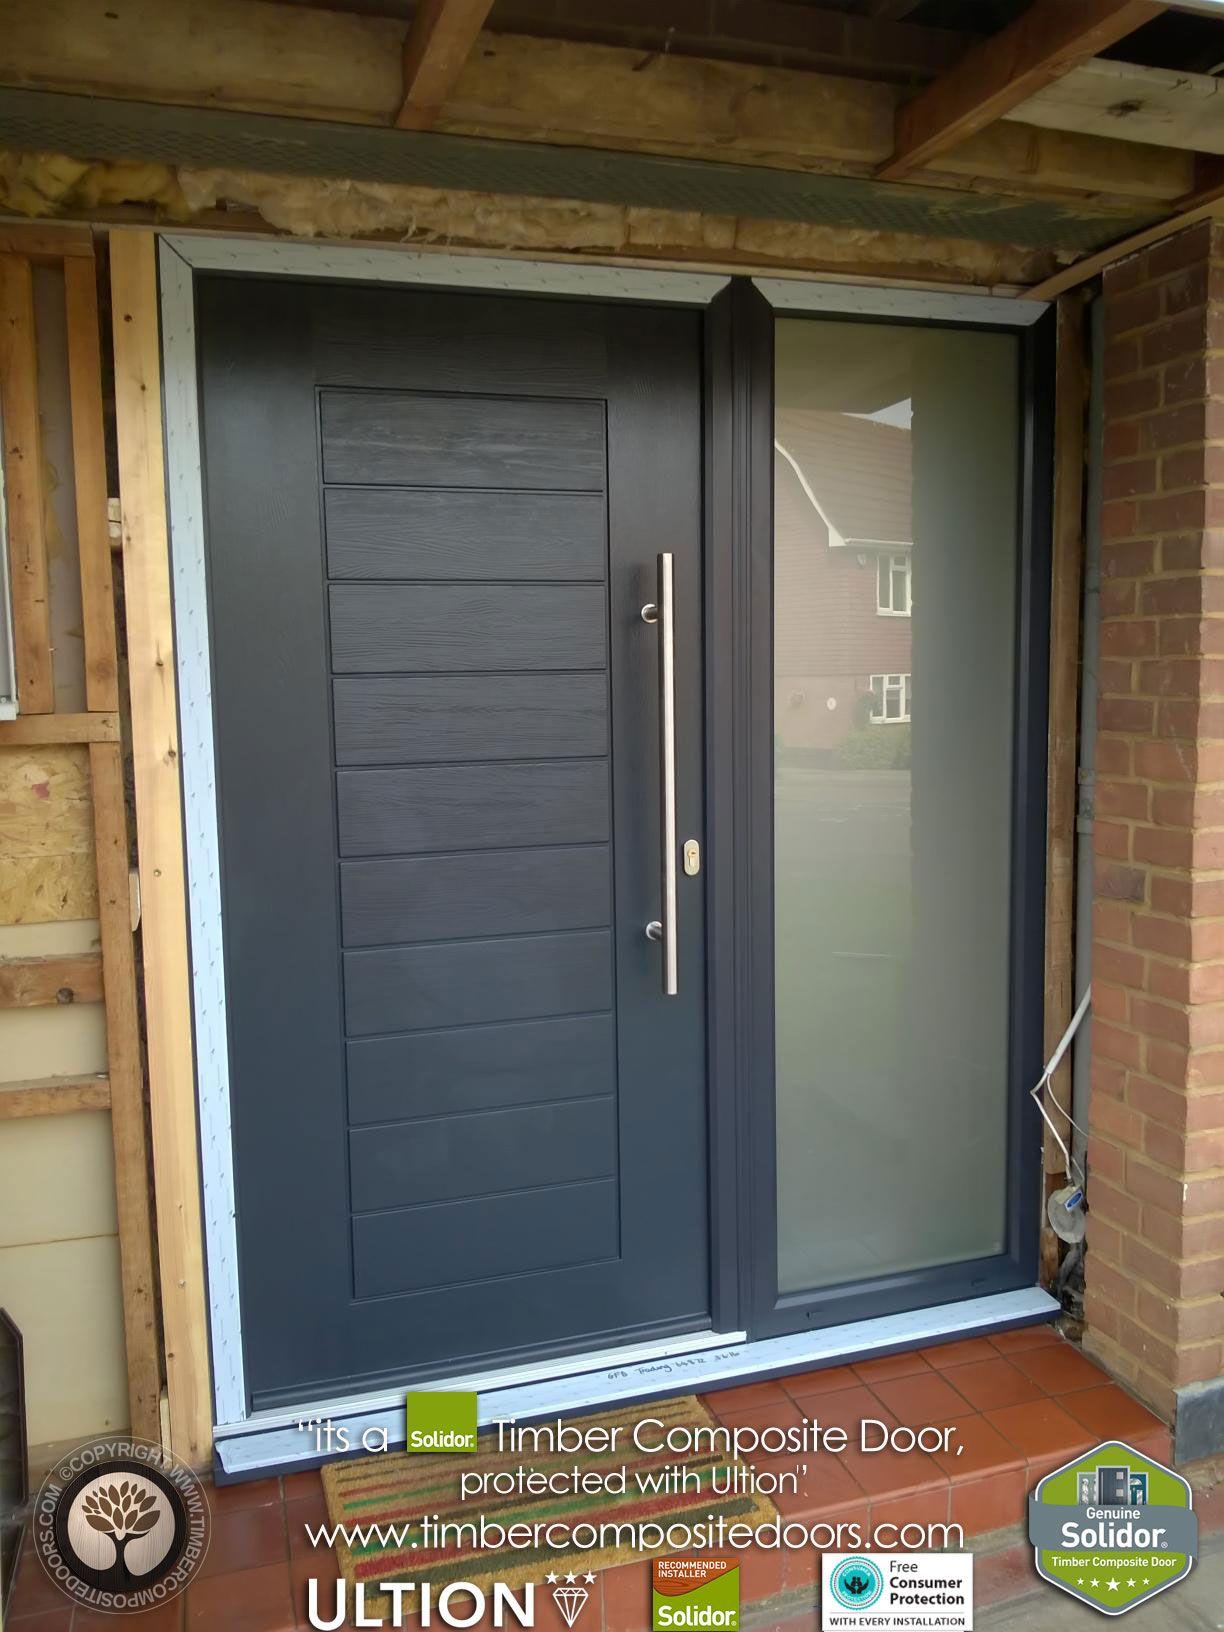 Anthracite Grey Palermo Solidor Timber Composite Door 56 Entryway